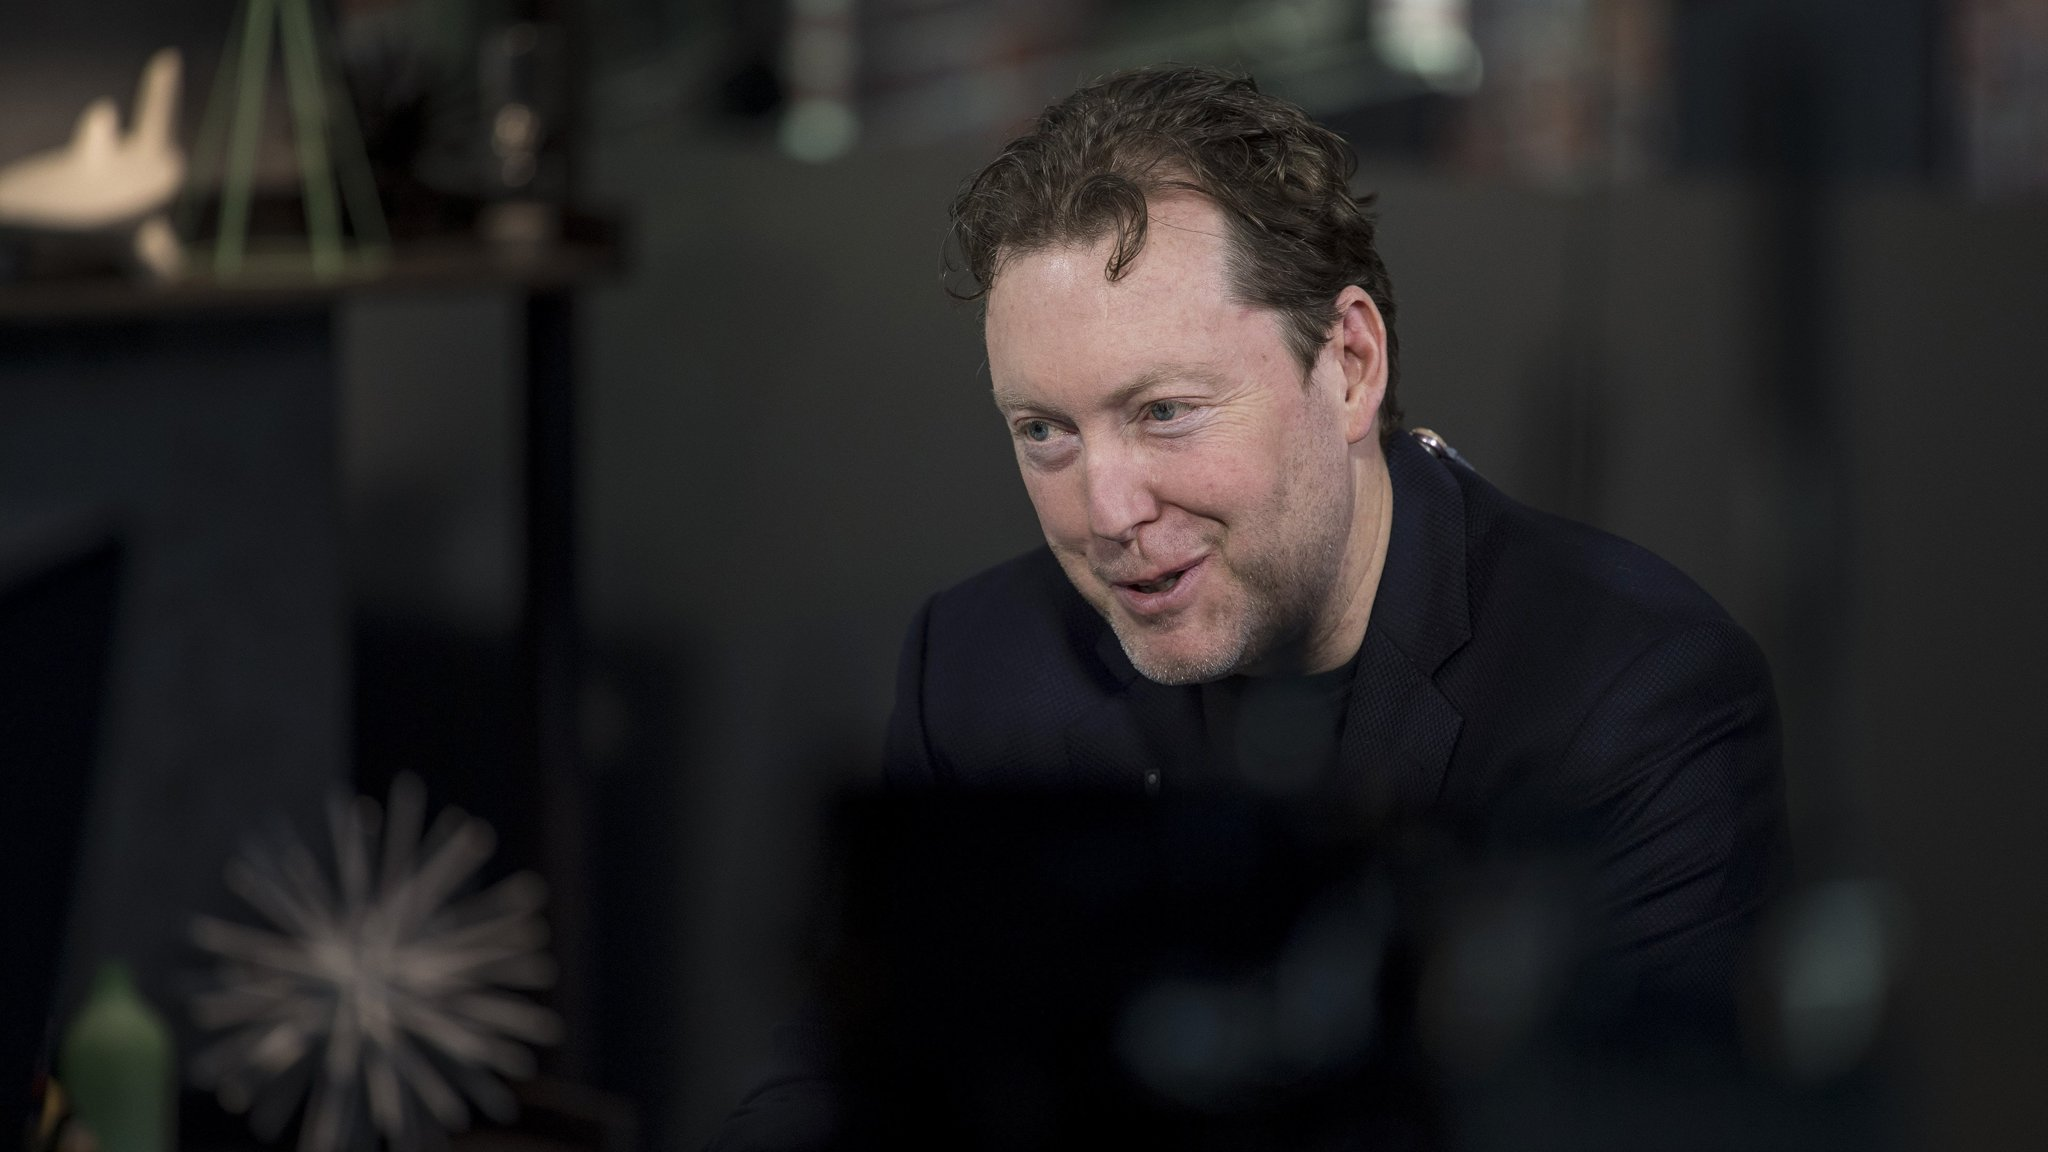 ft.com - SoFi sale talks founder as bidders balk at $8bn price tag